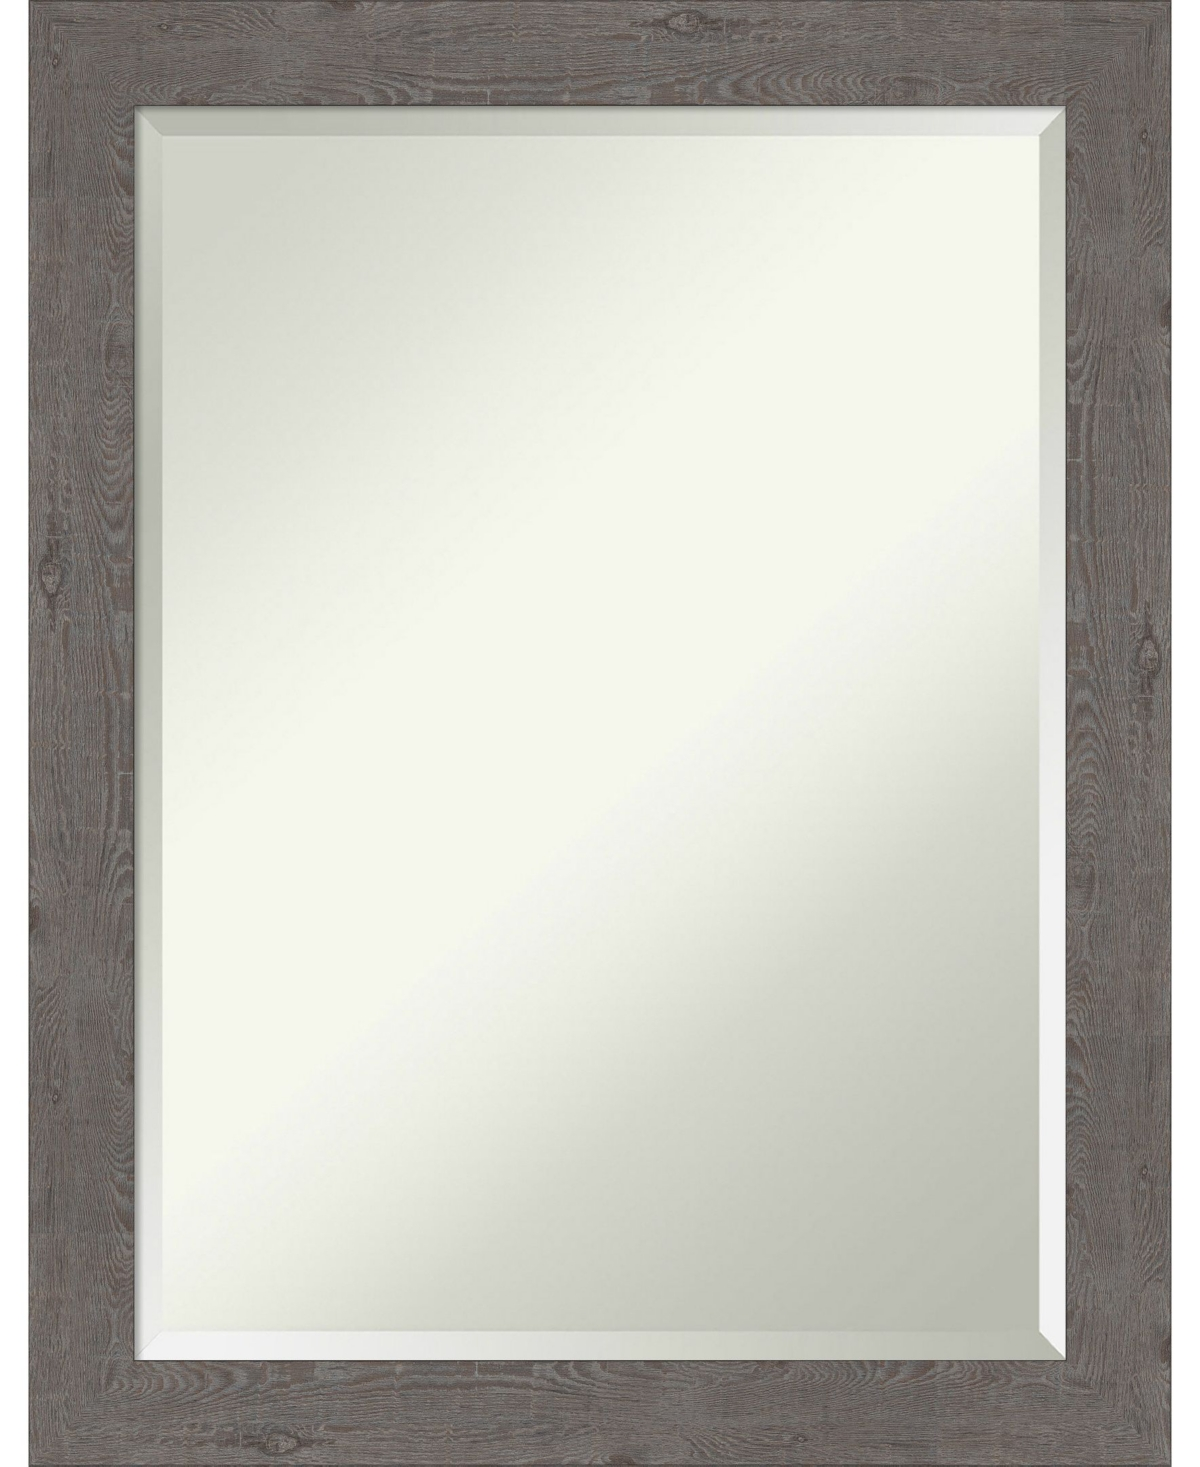 Amanti Art Rustic Plank Framed Bathroom Vanity Wall Mirror, 21.25